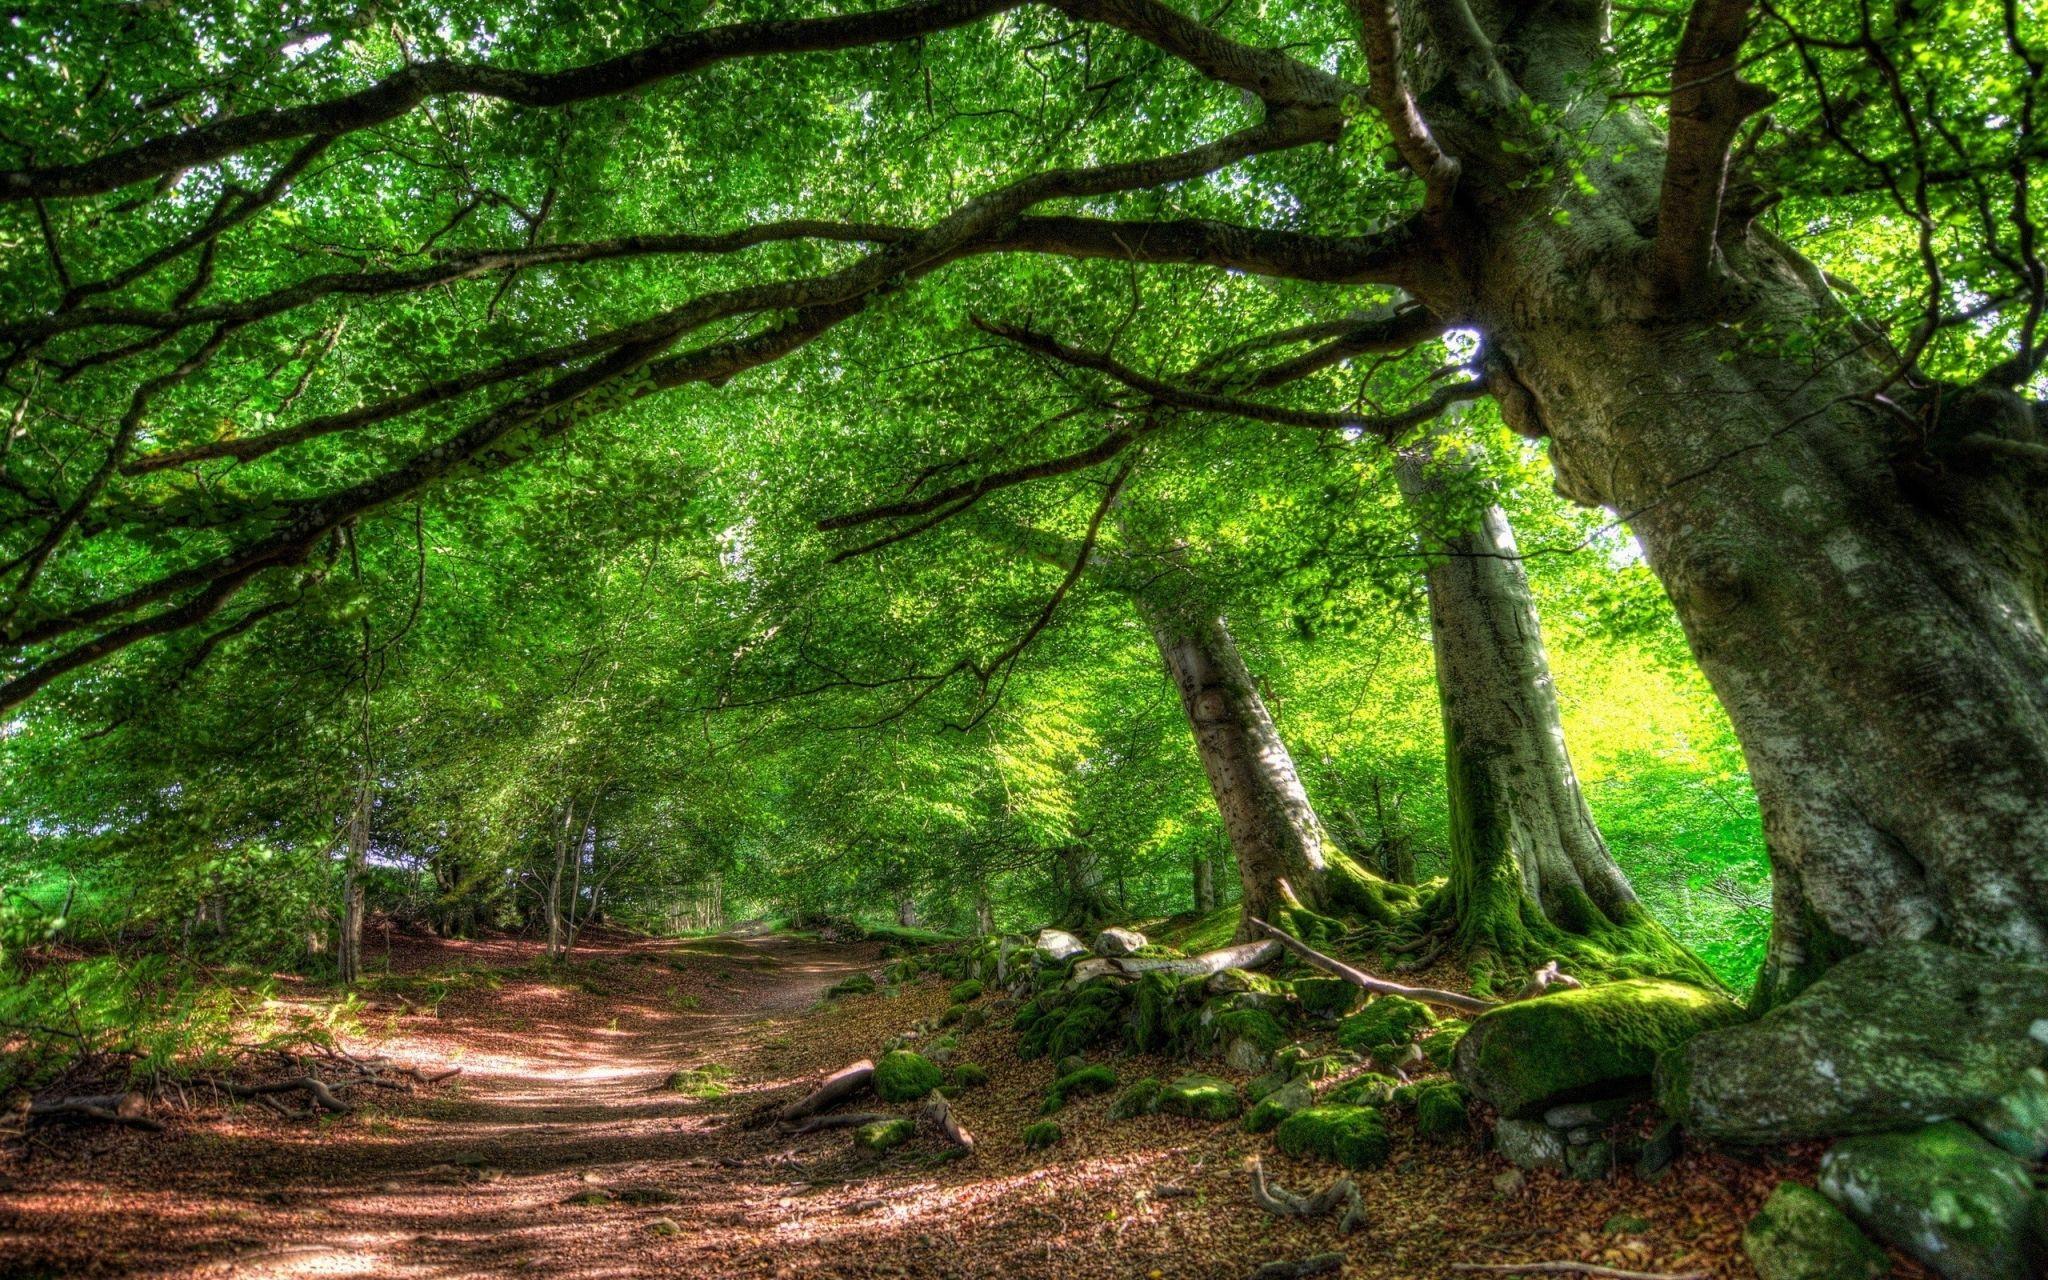 forest high resolution desktop backgrounds Forest canopy